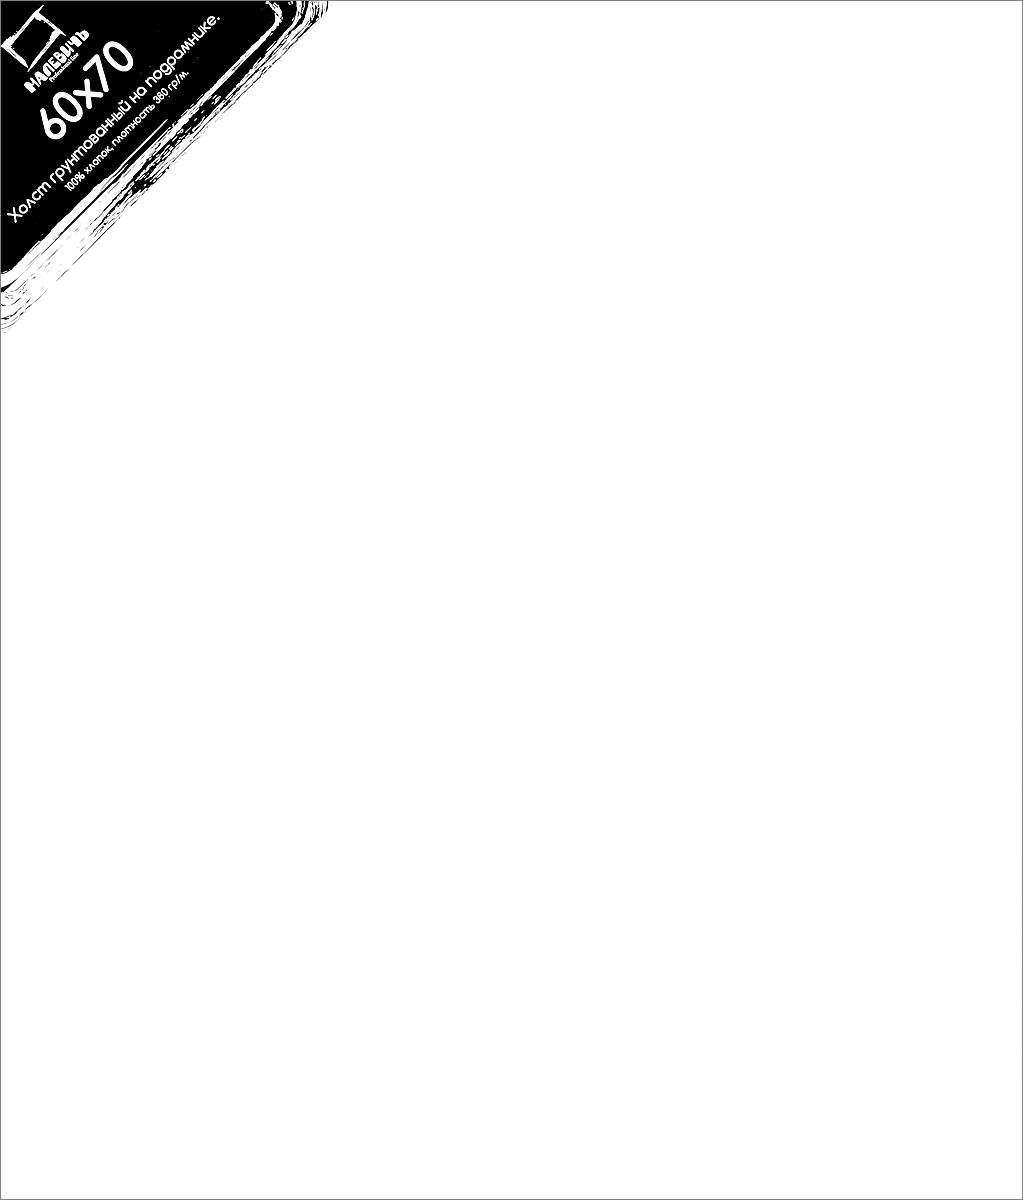 Малевичъ Холст на подрамнике 60 см x 70 см 380 г/м2